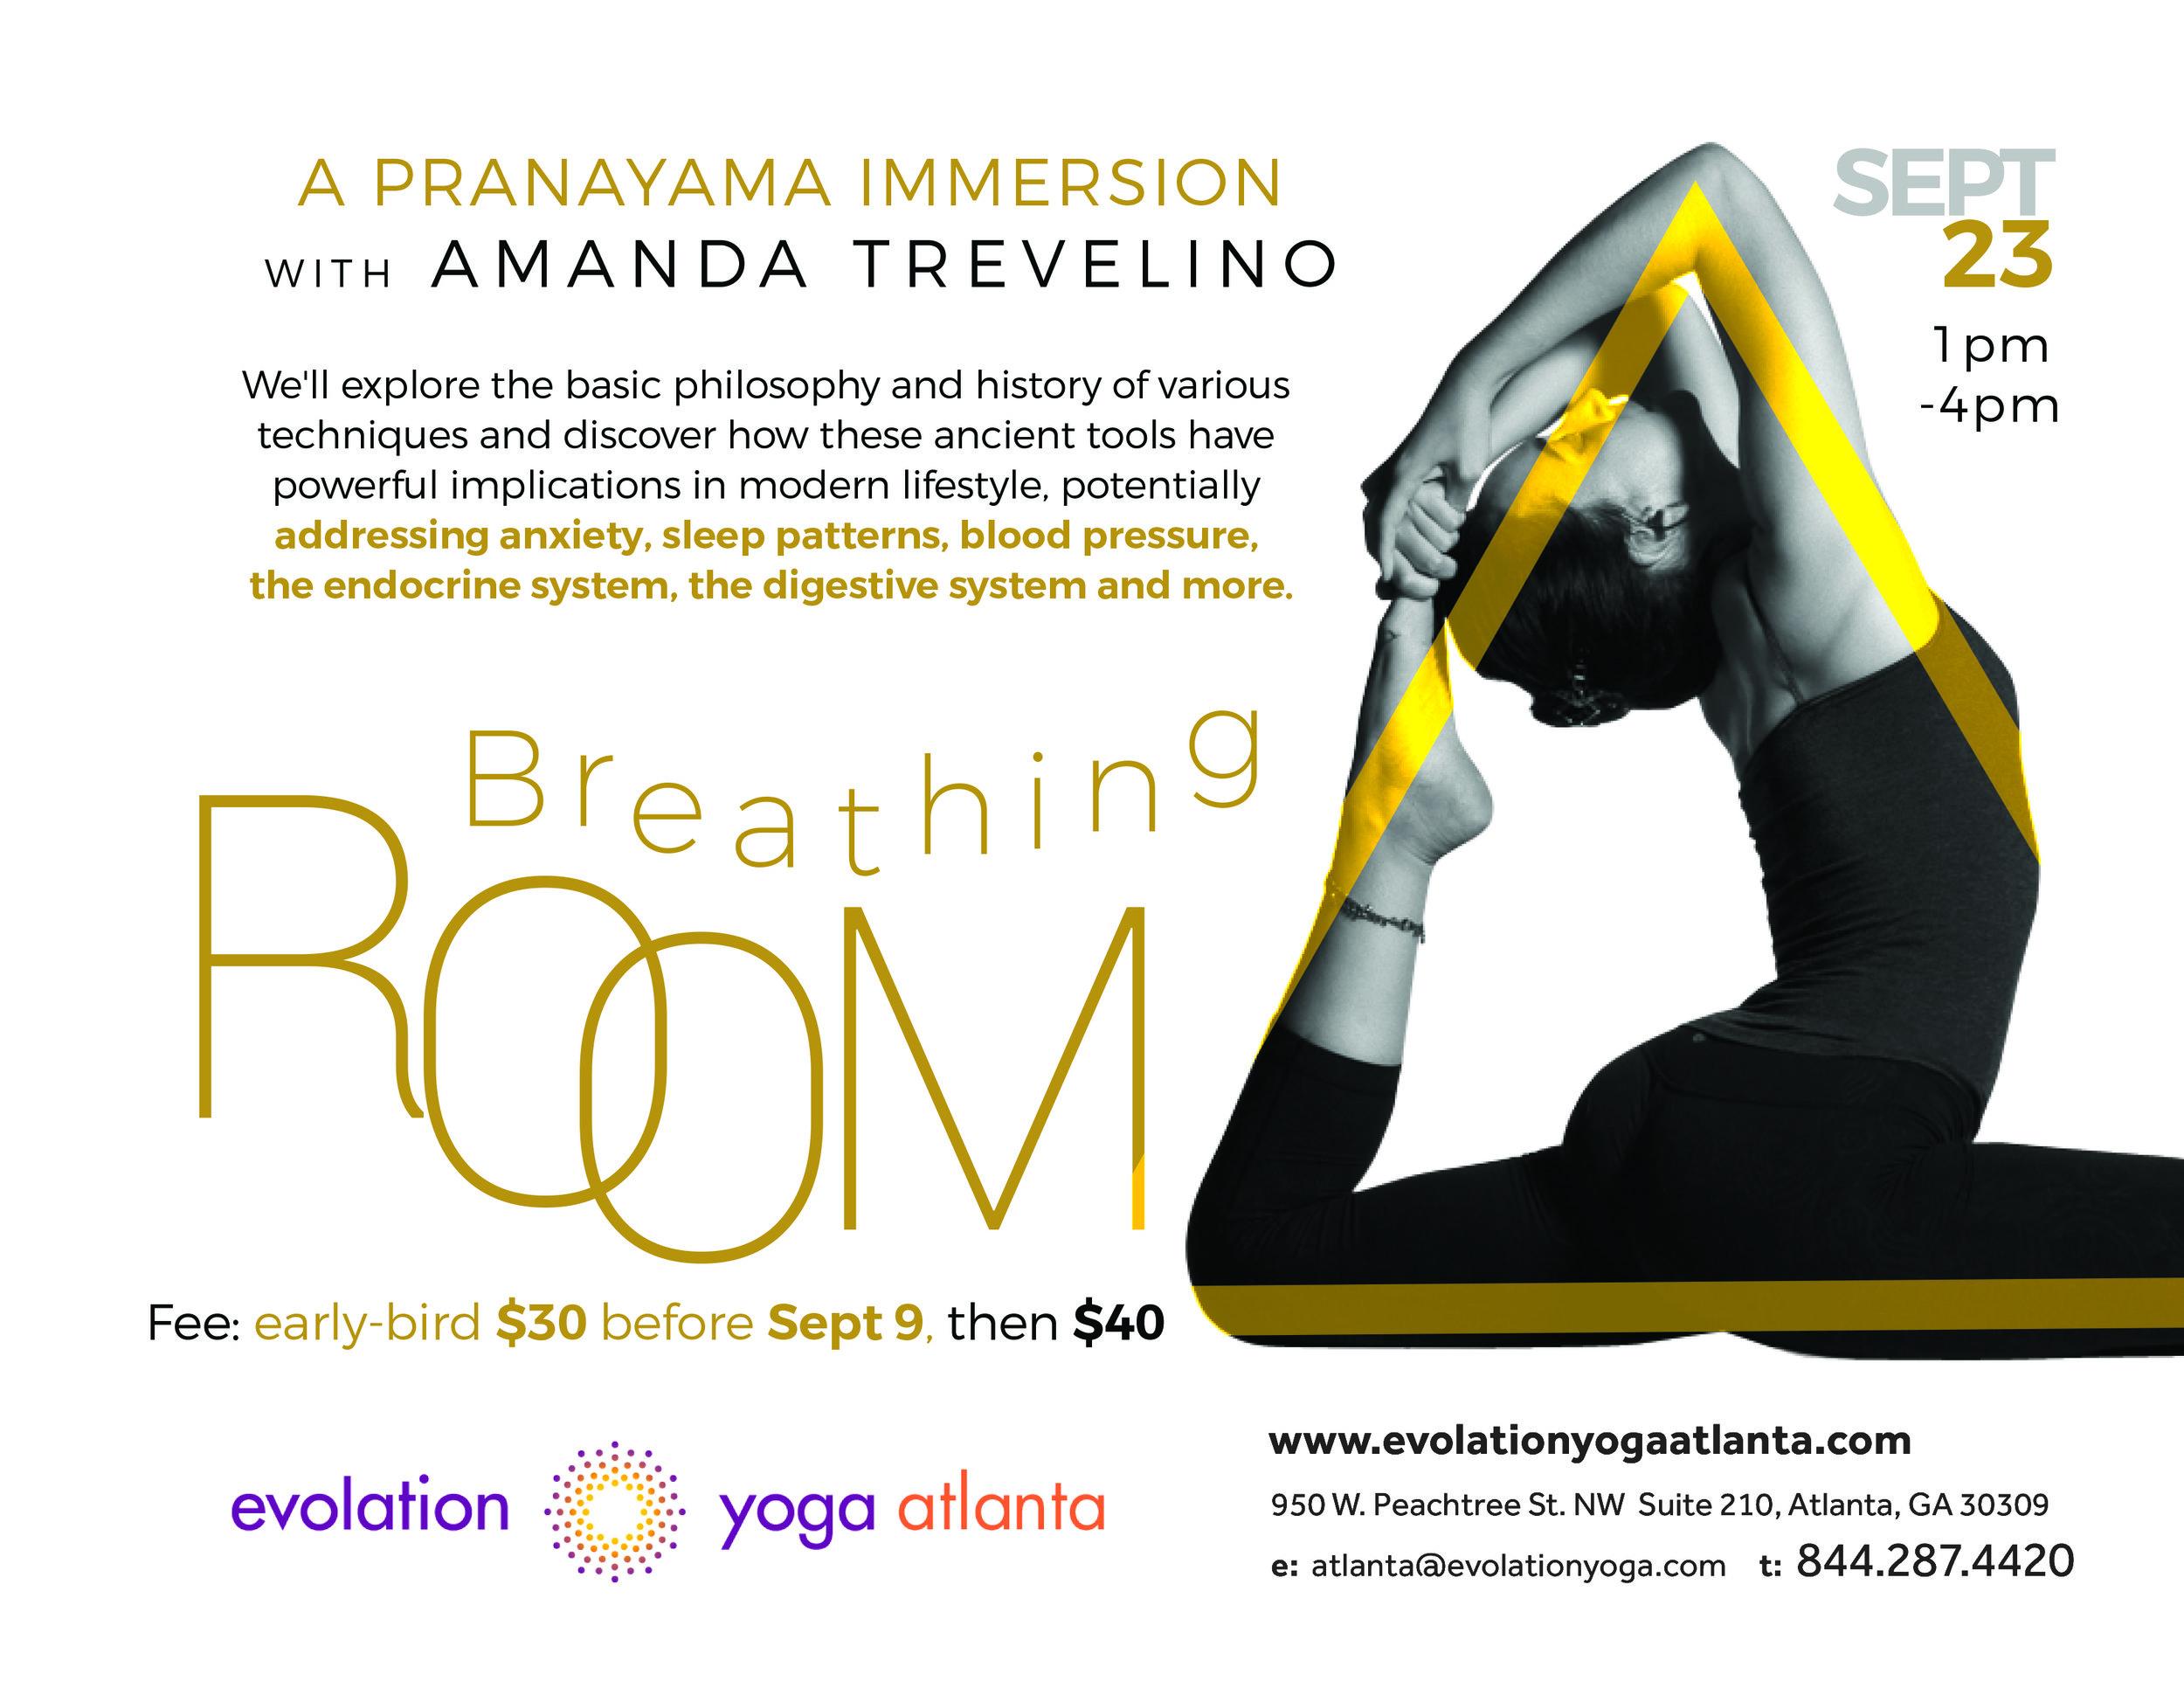 Prenatal teaching event at Evolation Yoga